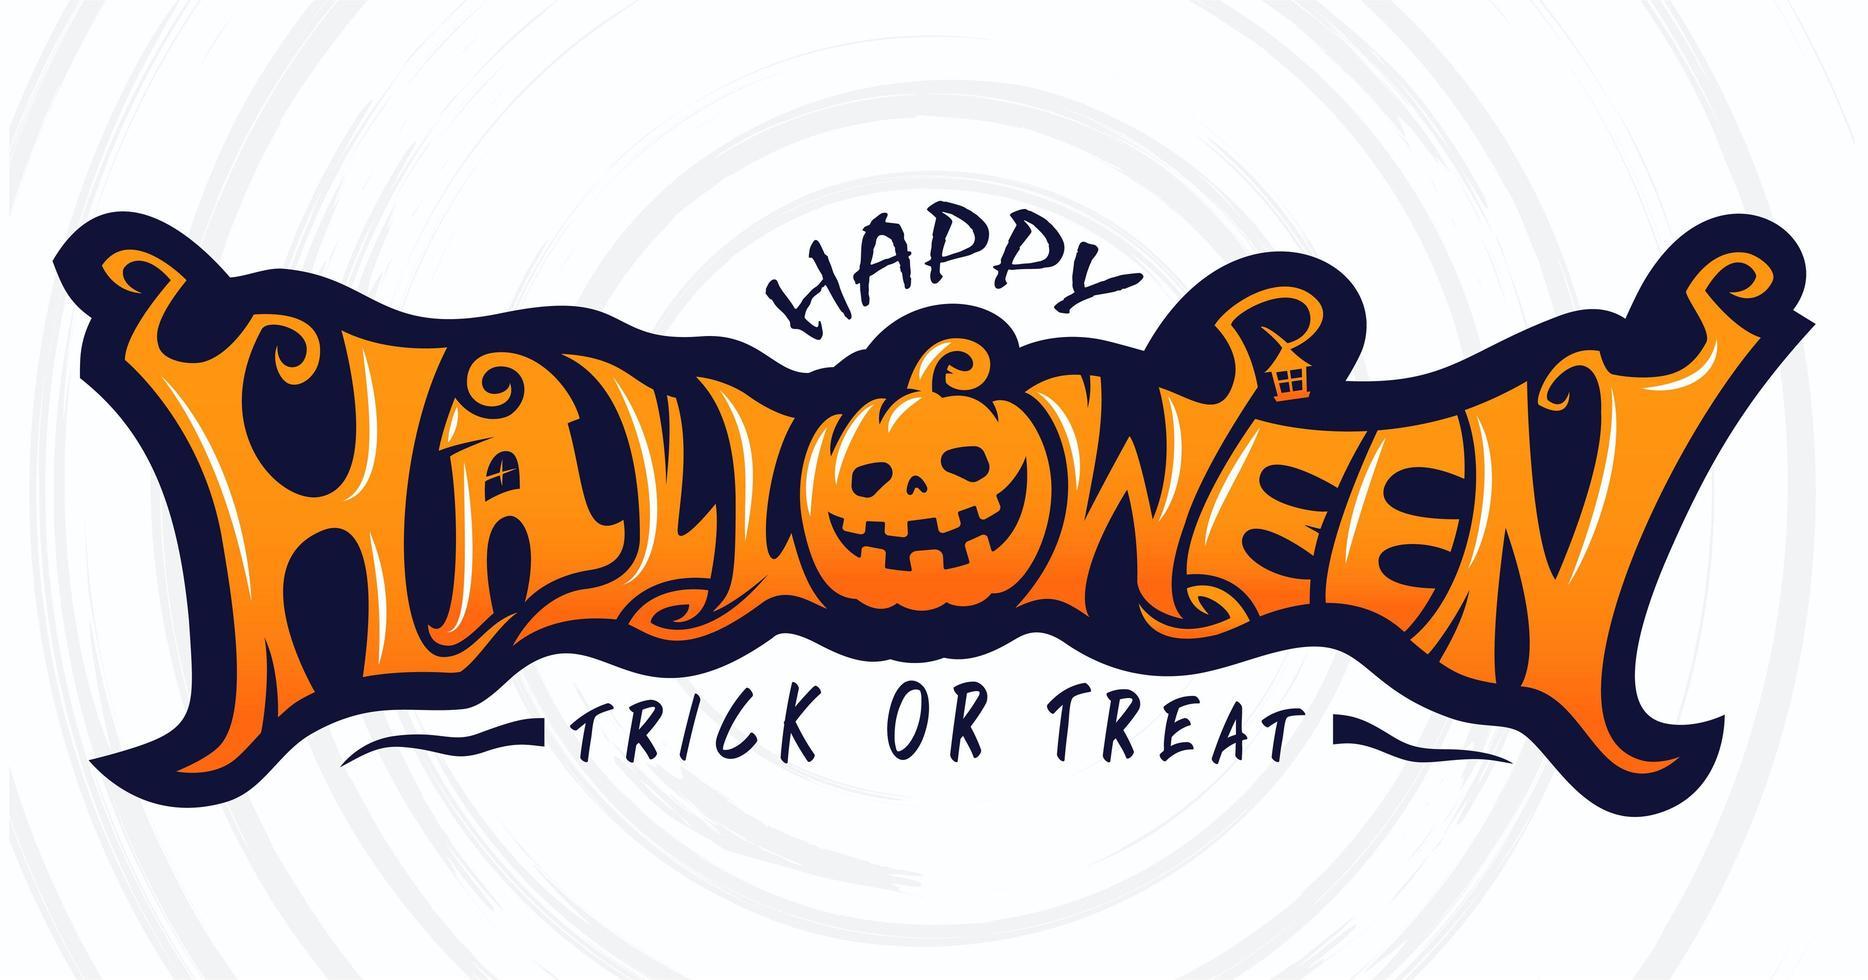 Happy Halloween Trick or Treat Text Banner vector